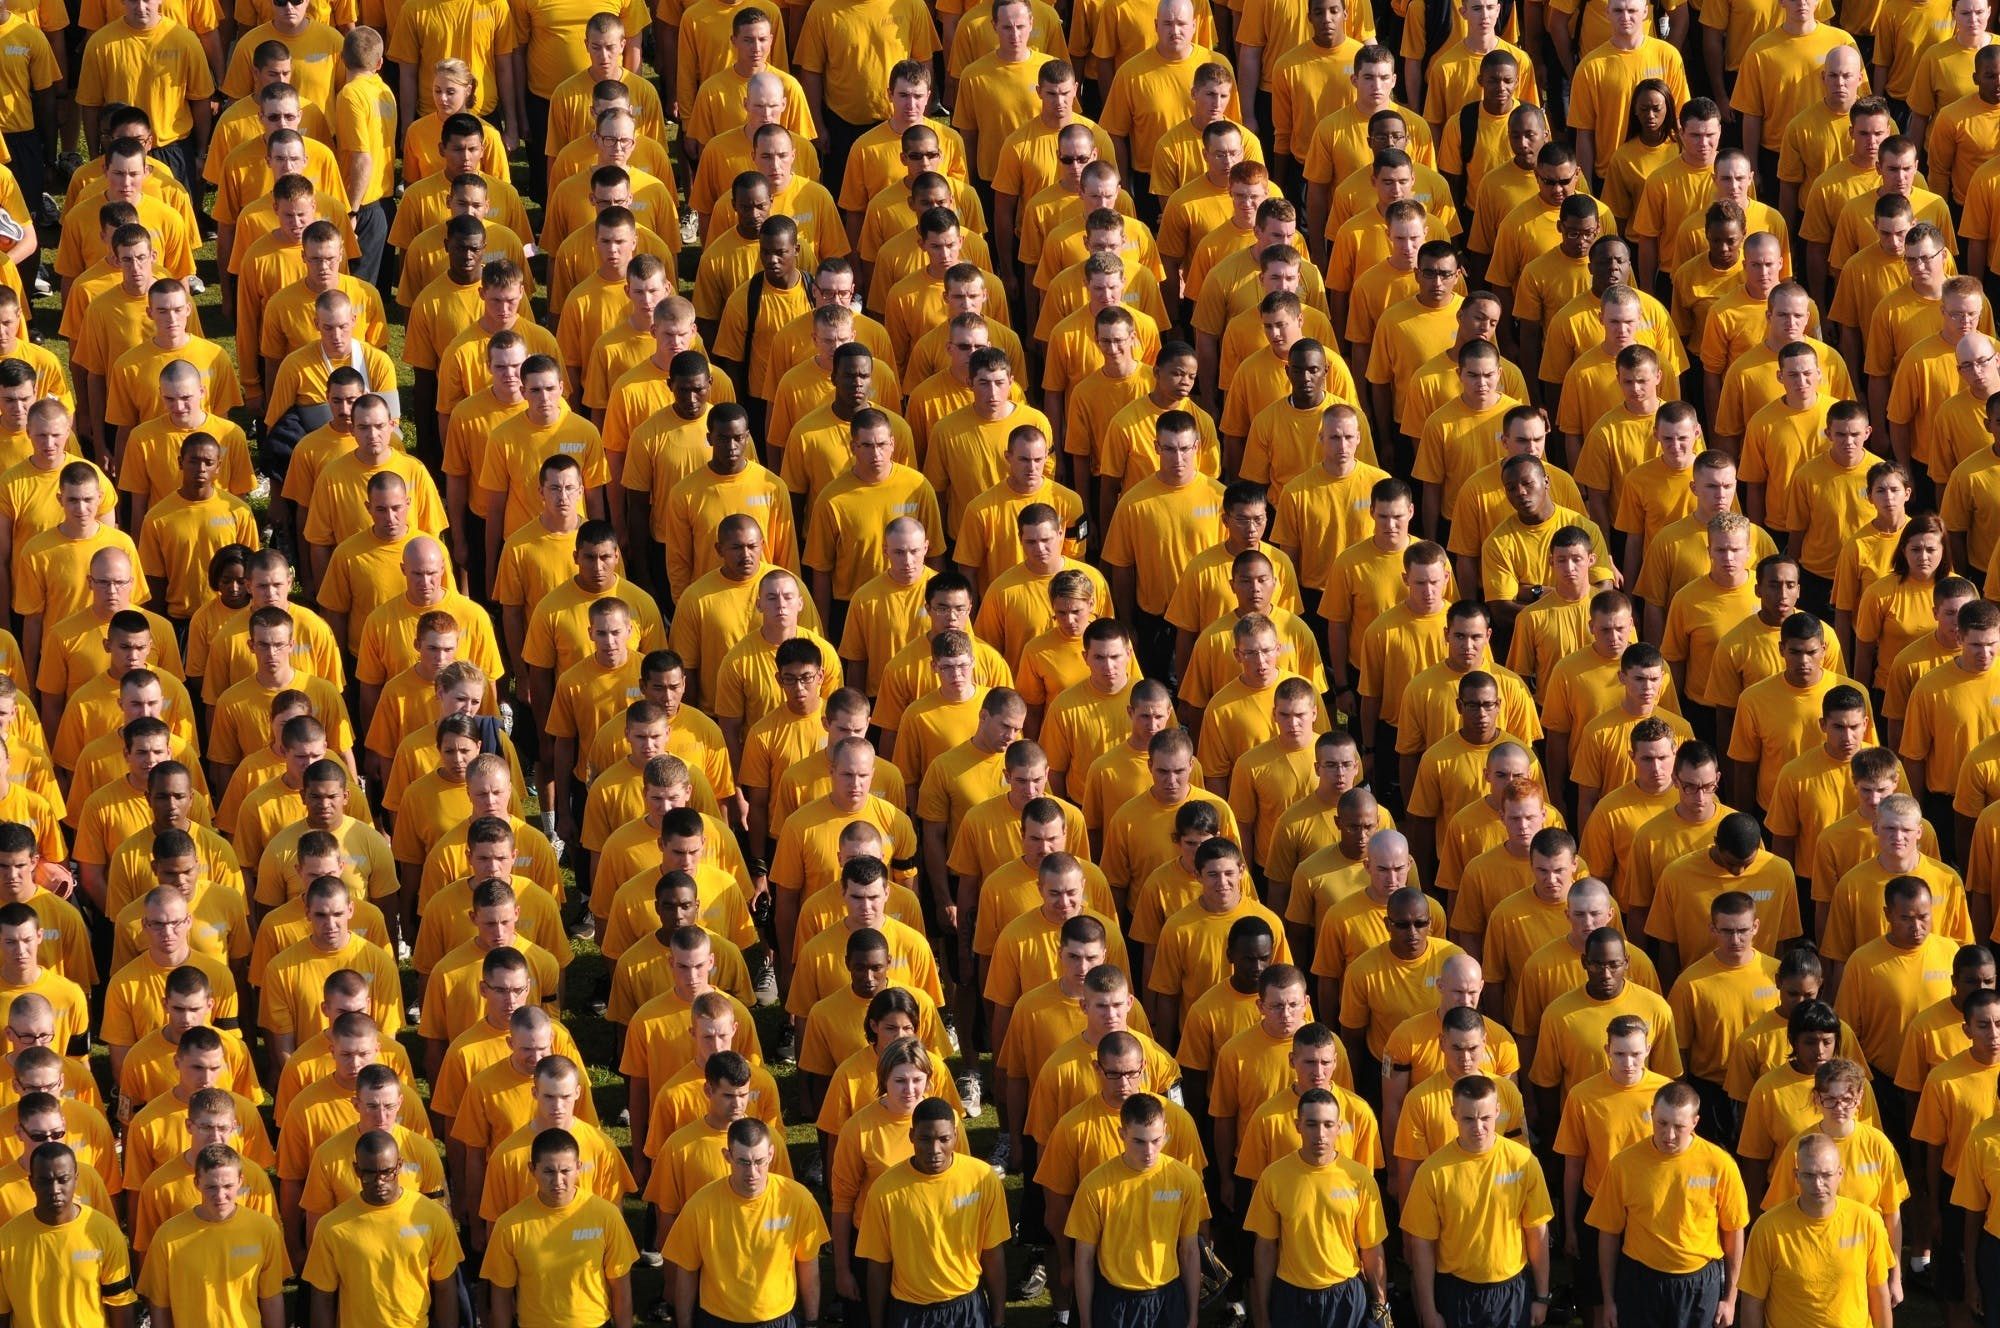 Kostenloses Stock Foto zu aufmerksam, gemeinschaft, gruppe, männer